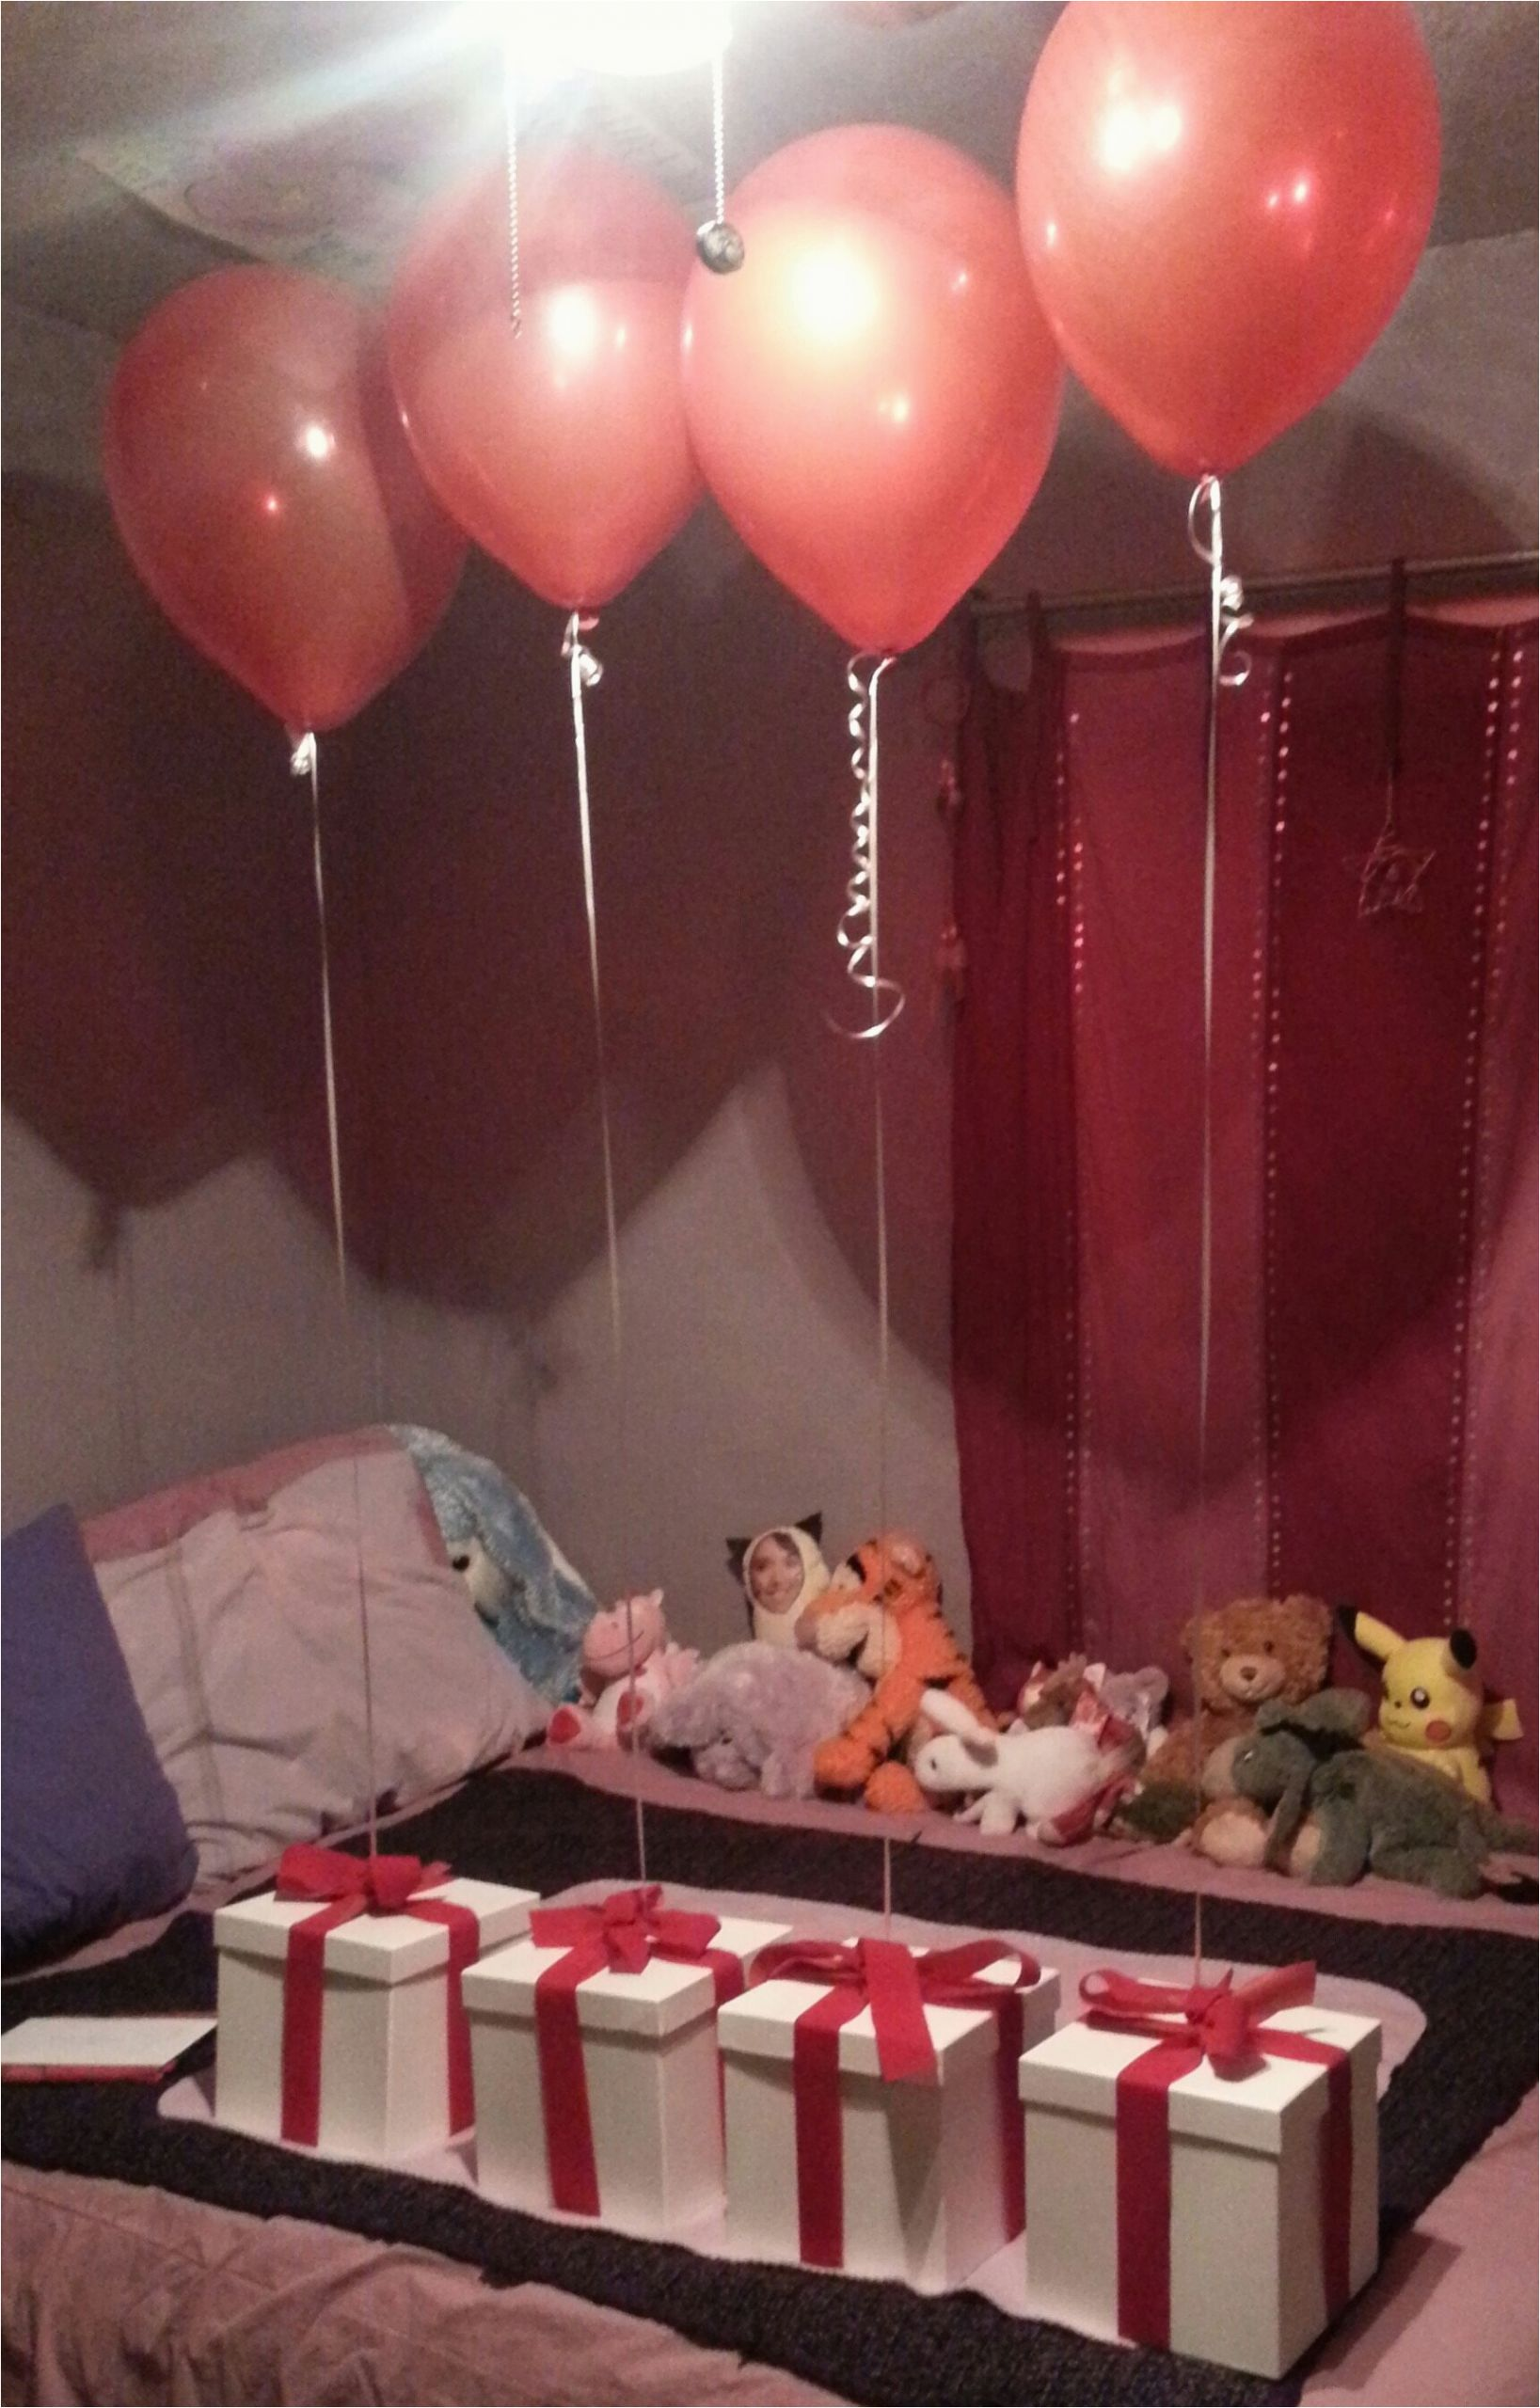 Budget Friendly Birthday Gifts for Boyfriend 10 Unique Grandparents Day Ideas for School